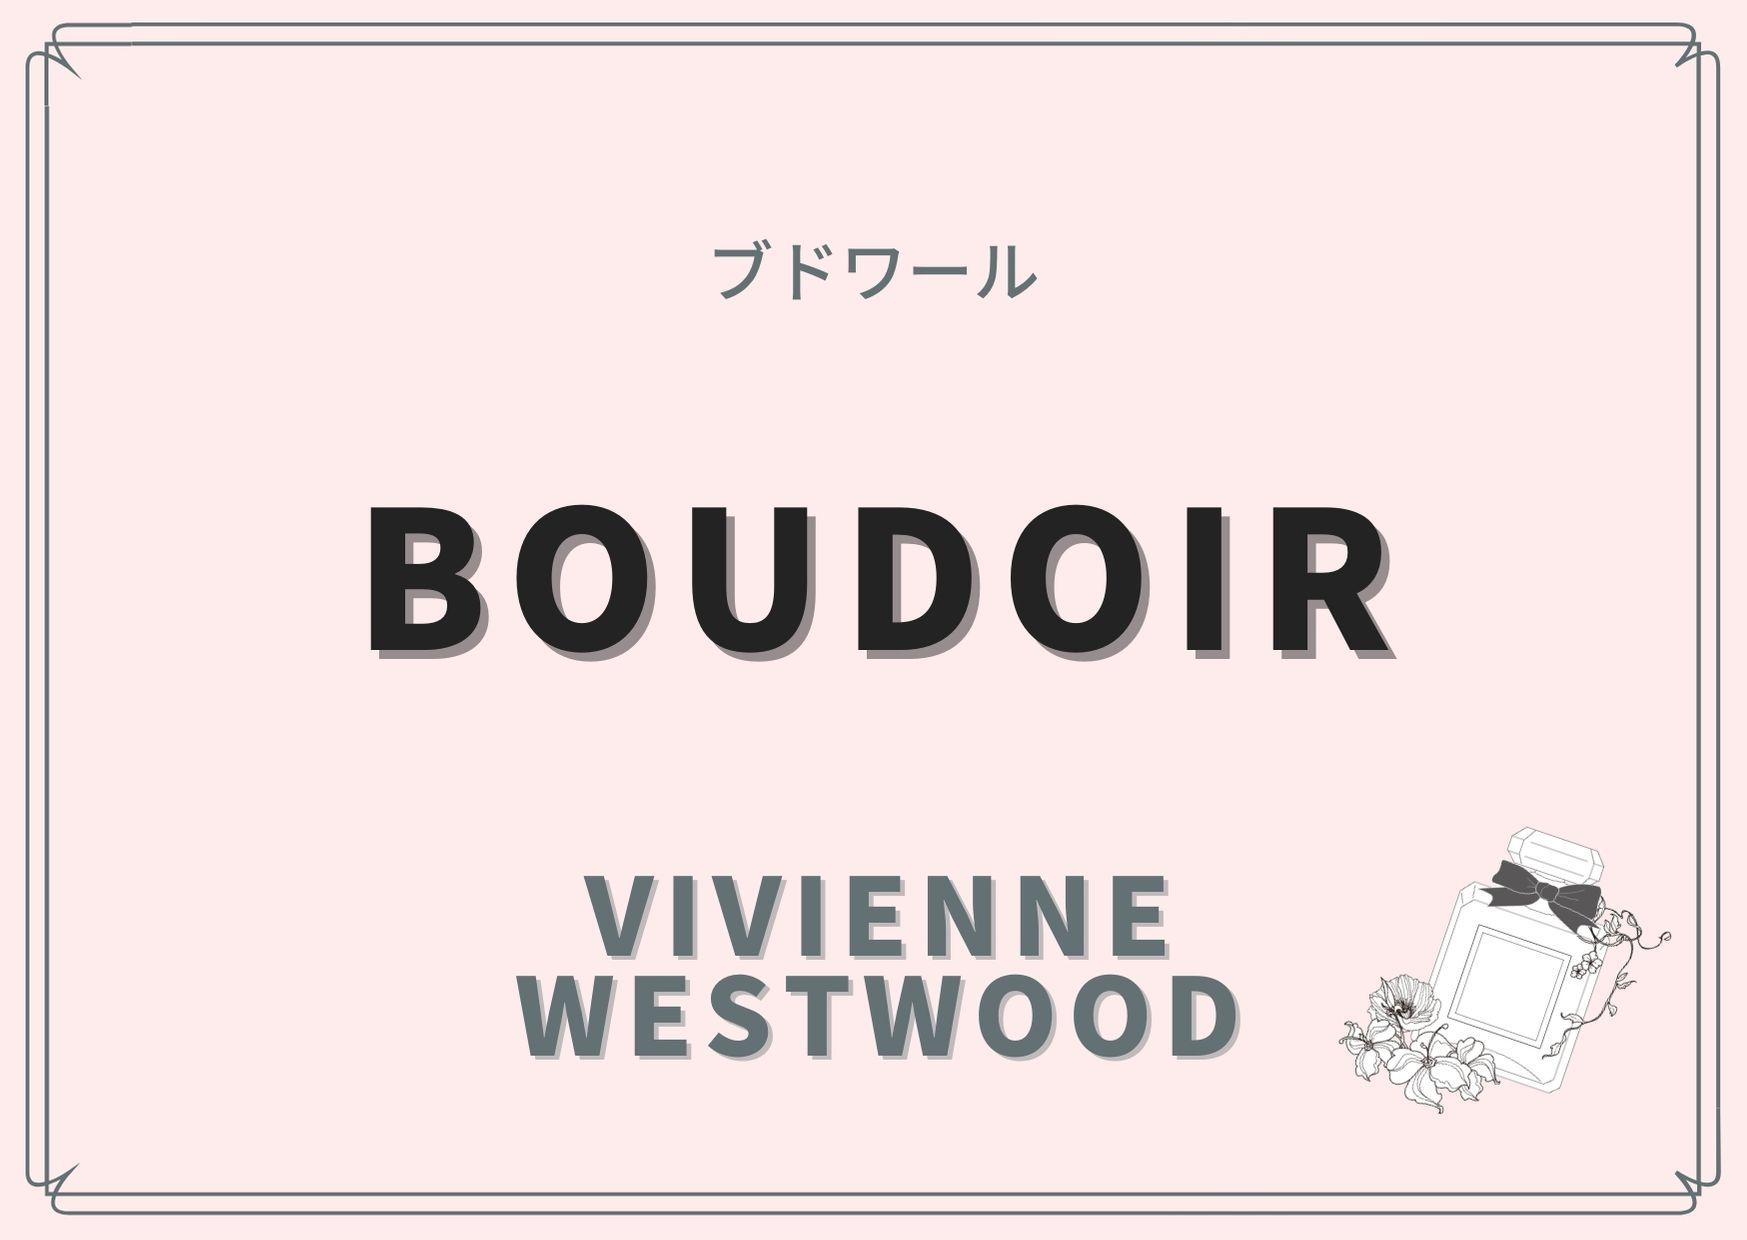 BOUDOIR(ブドワール)/Vivienne Westwood(ヴィヴィアンウエストウッド)